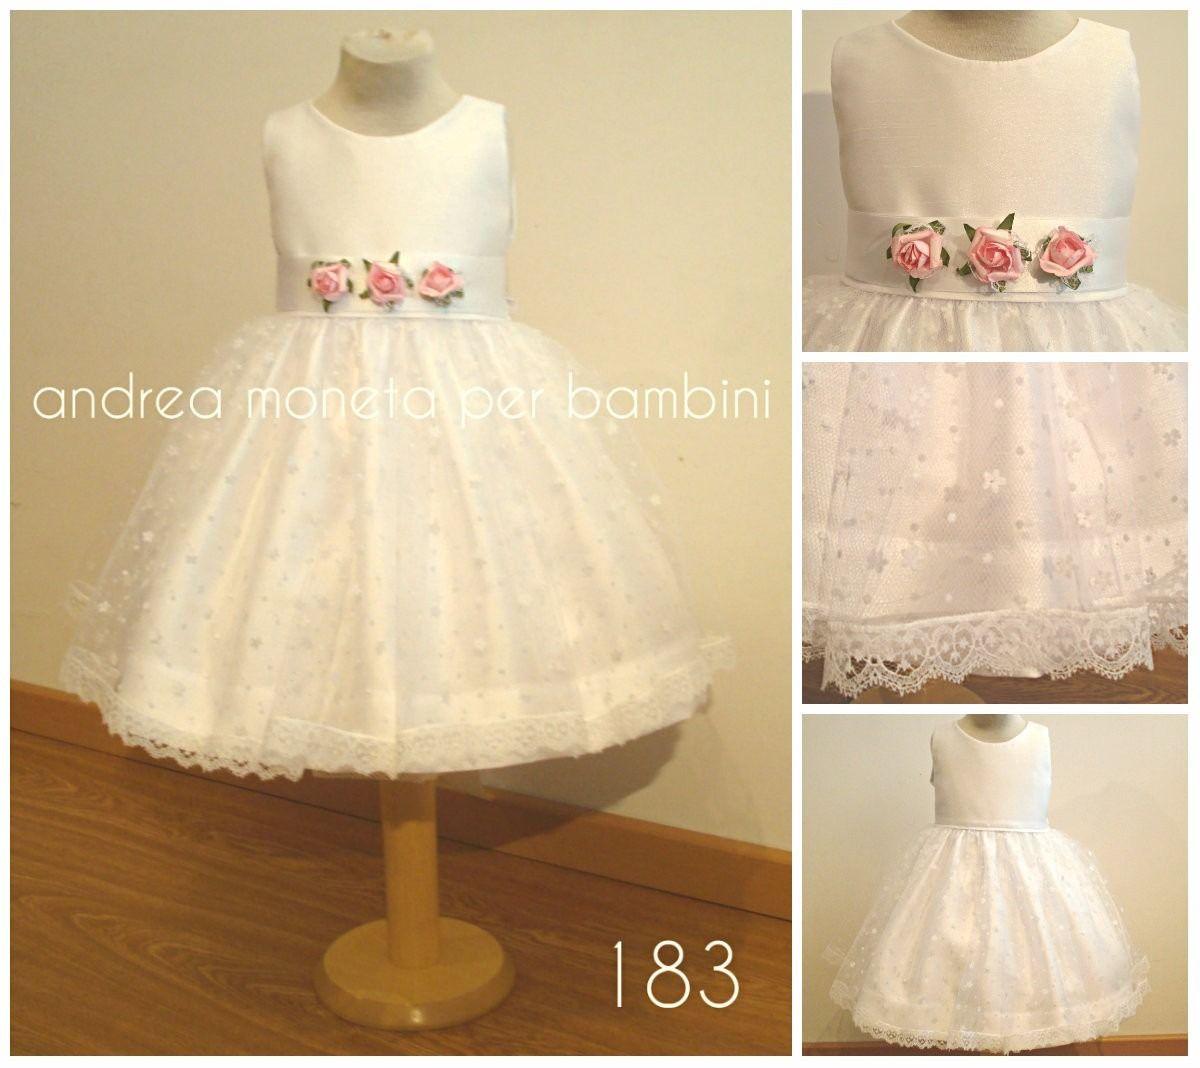 c883f393a Vestido Bautismo Fiesta Cumple Bebe Nena Andrea Moneta 183 -   2.990 ...